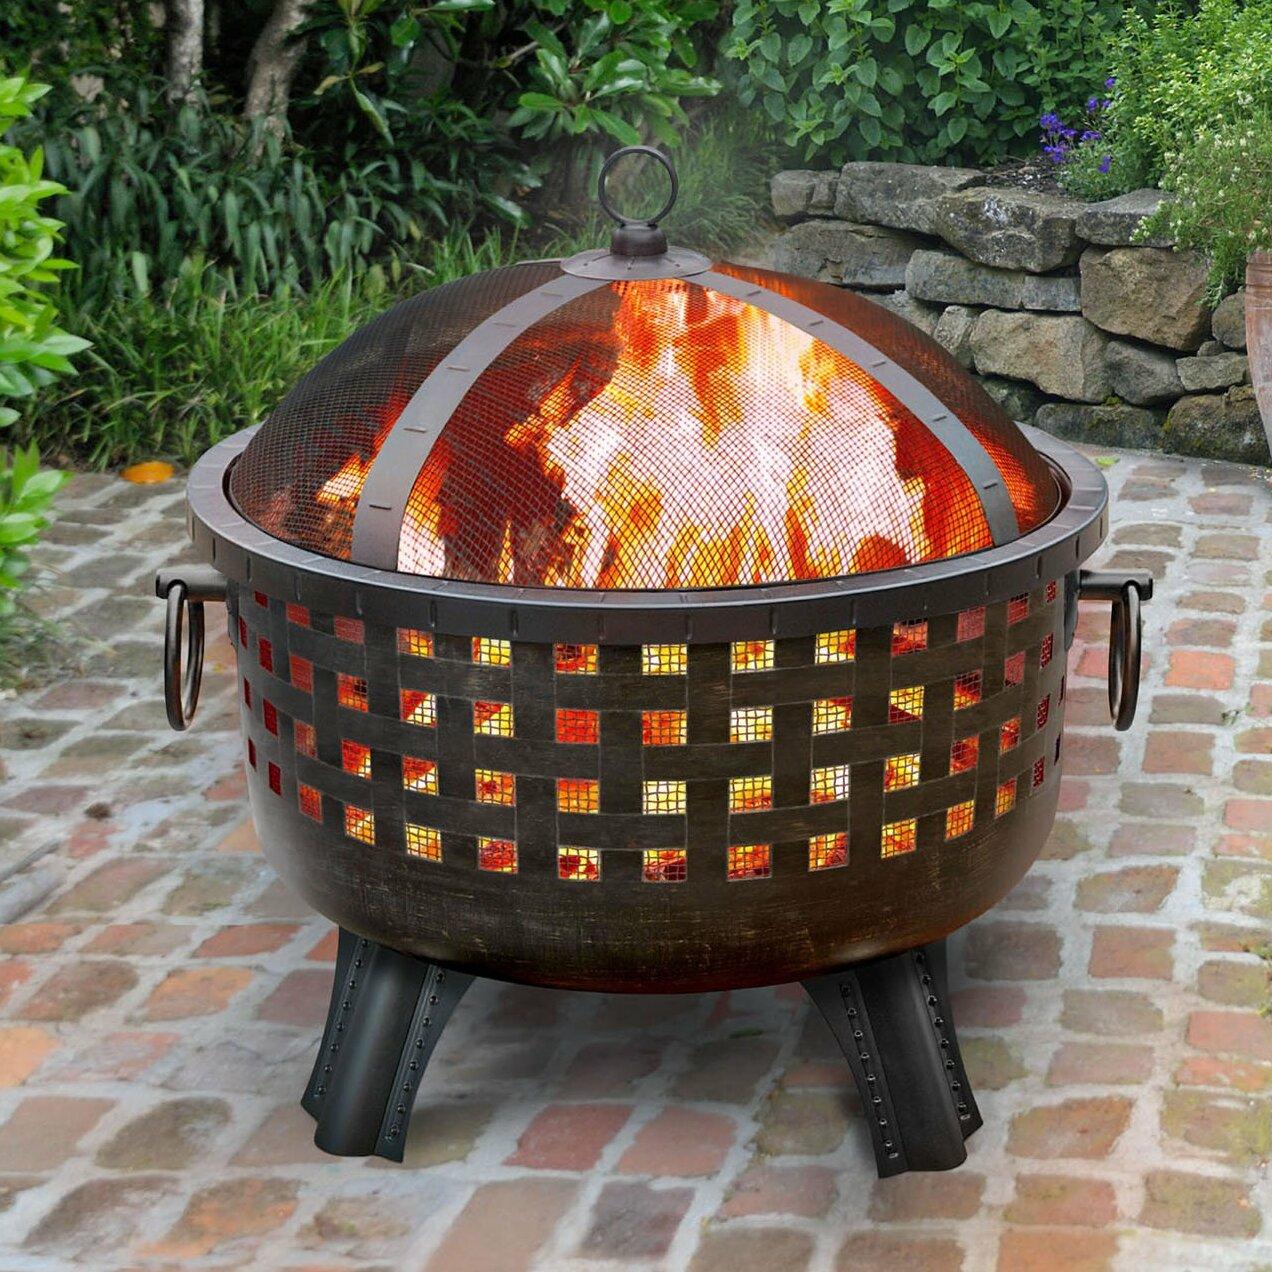 Wayfair | Landmann Garden Lights Savannah Wood Burning Fire Pit